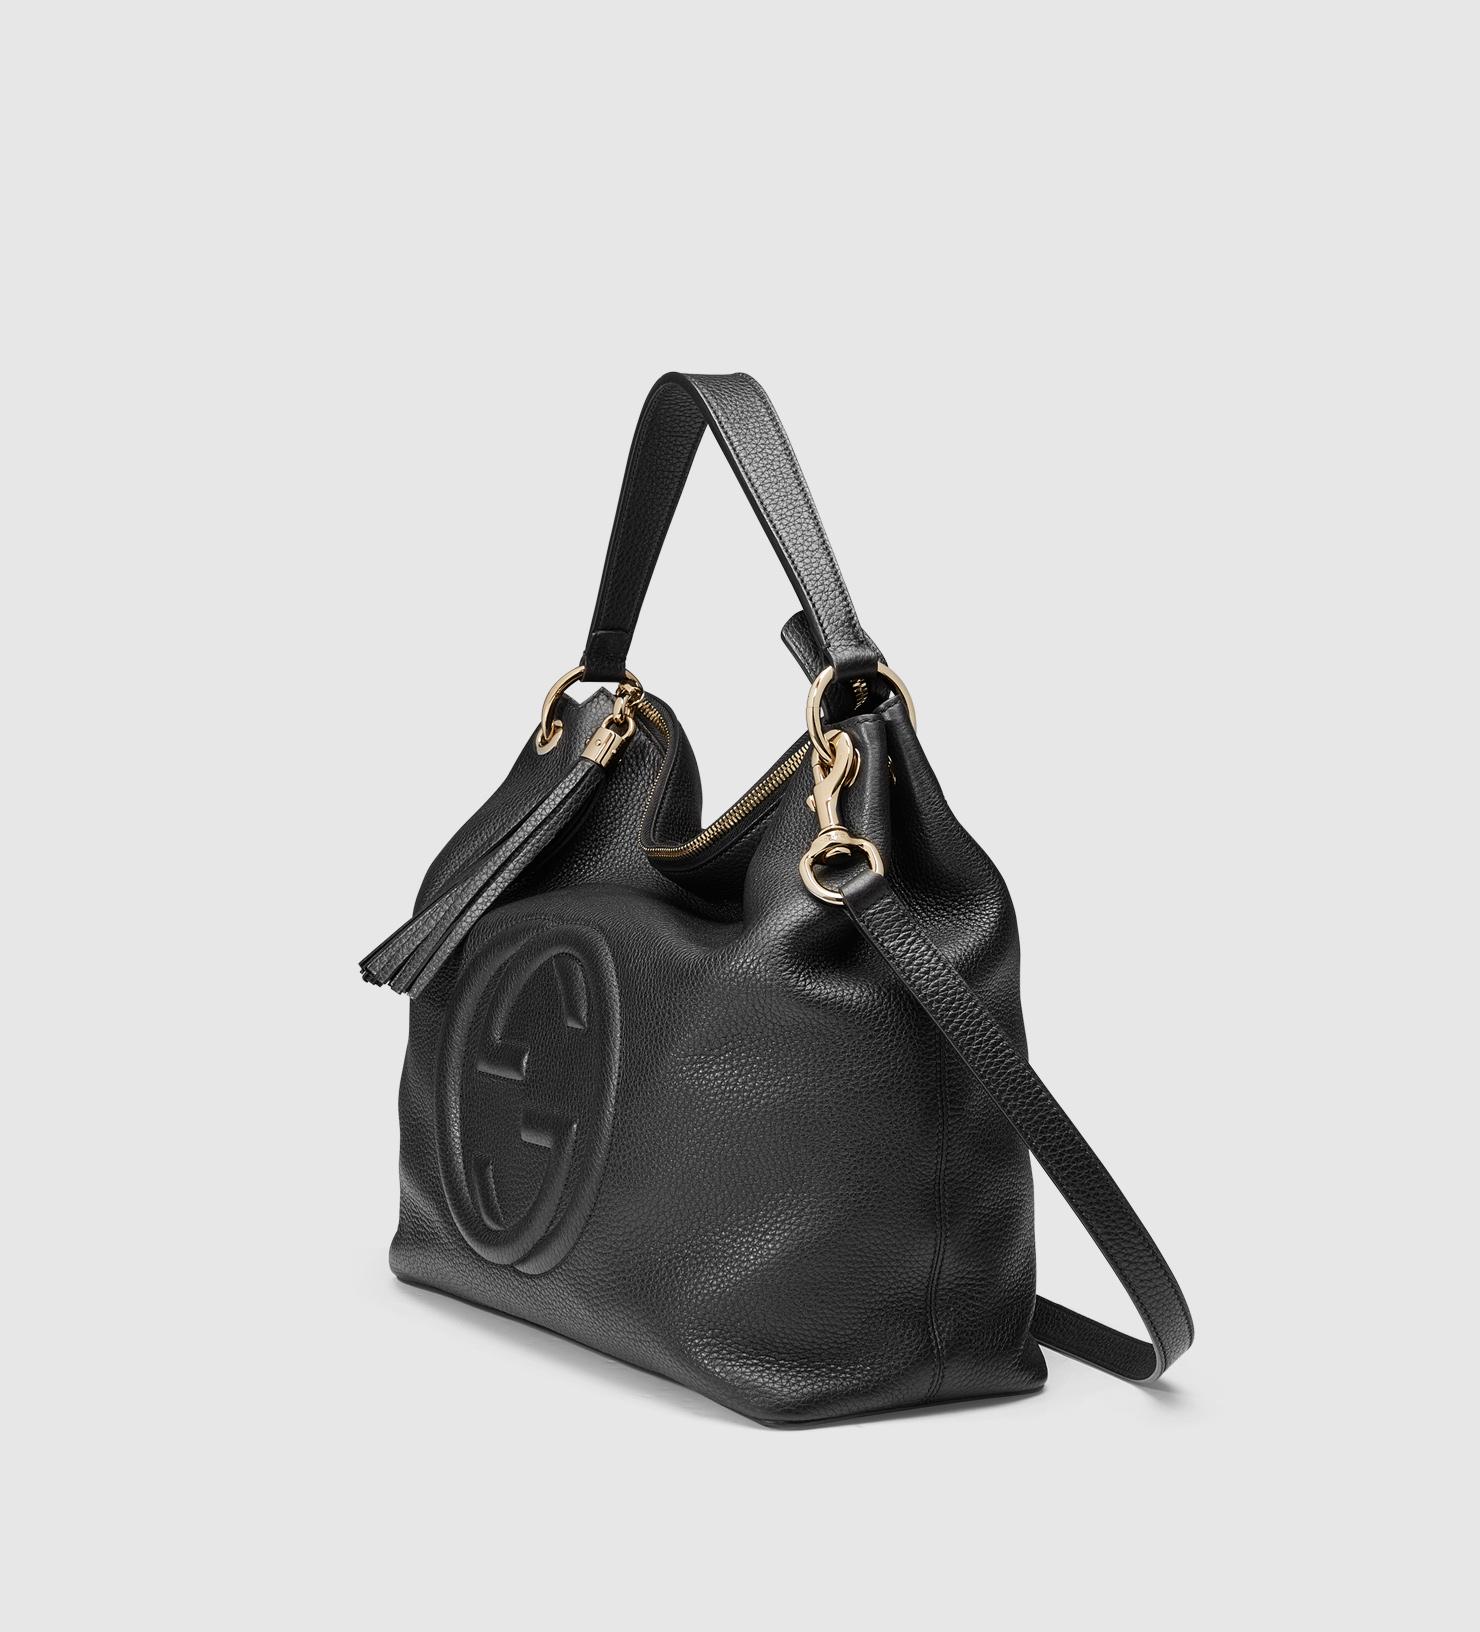 cad5f5c6db730c Gucci Soho Leather Hobo in Black - Lyst